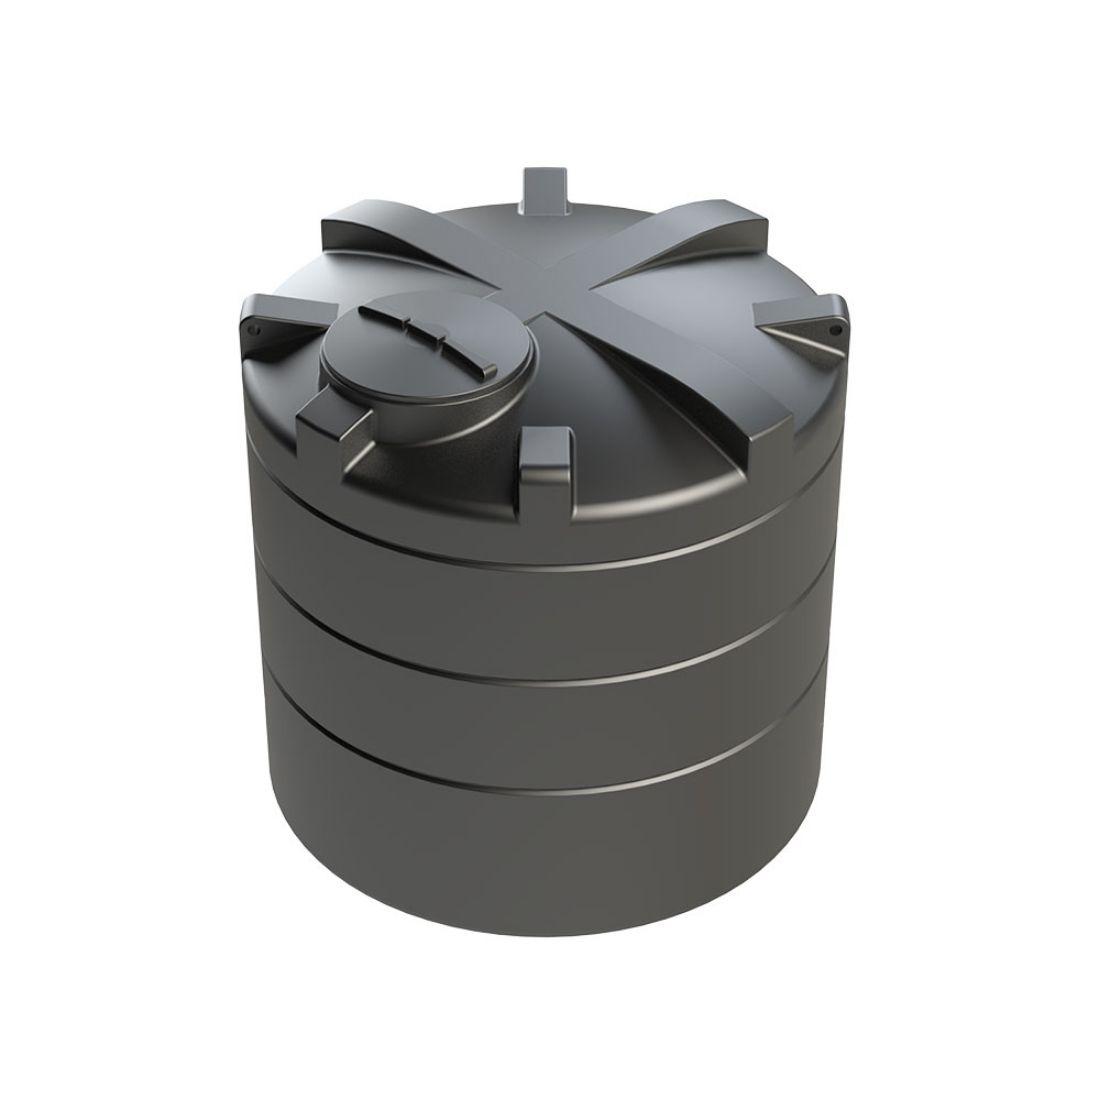 Enduramaxx 4,000 Litre Vertical Non-Potable Water Storage Tank